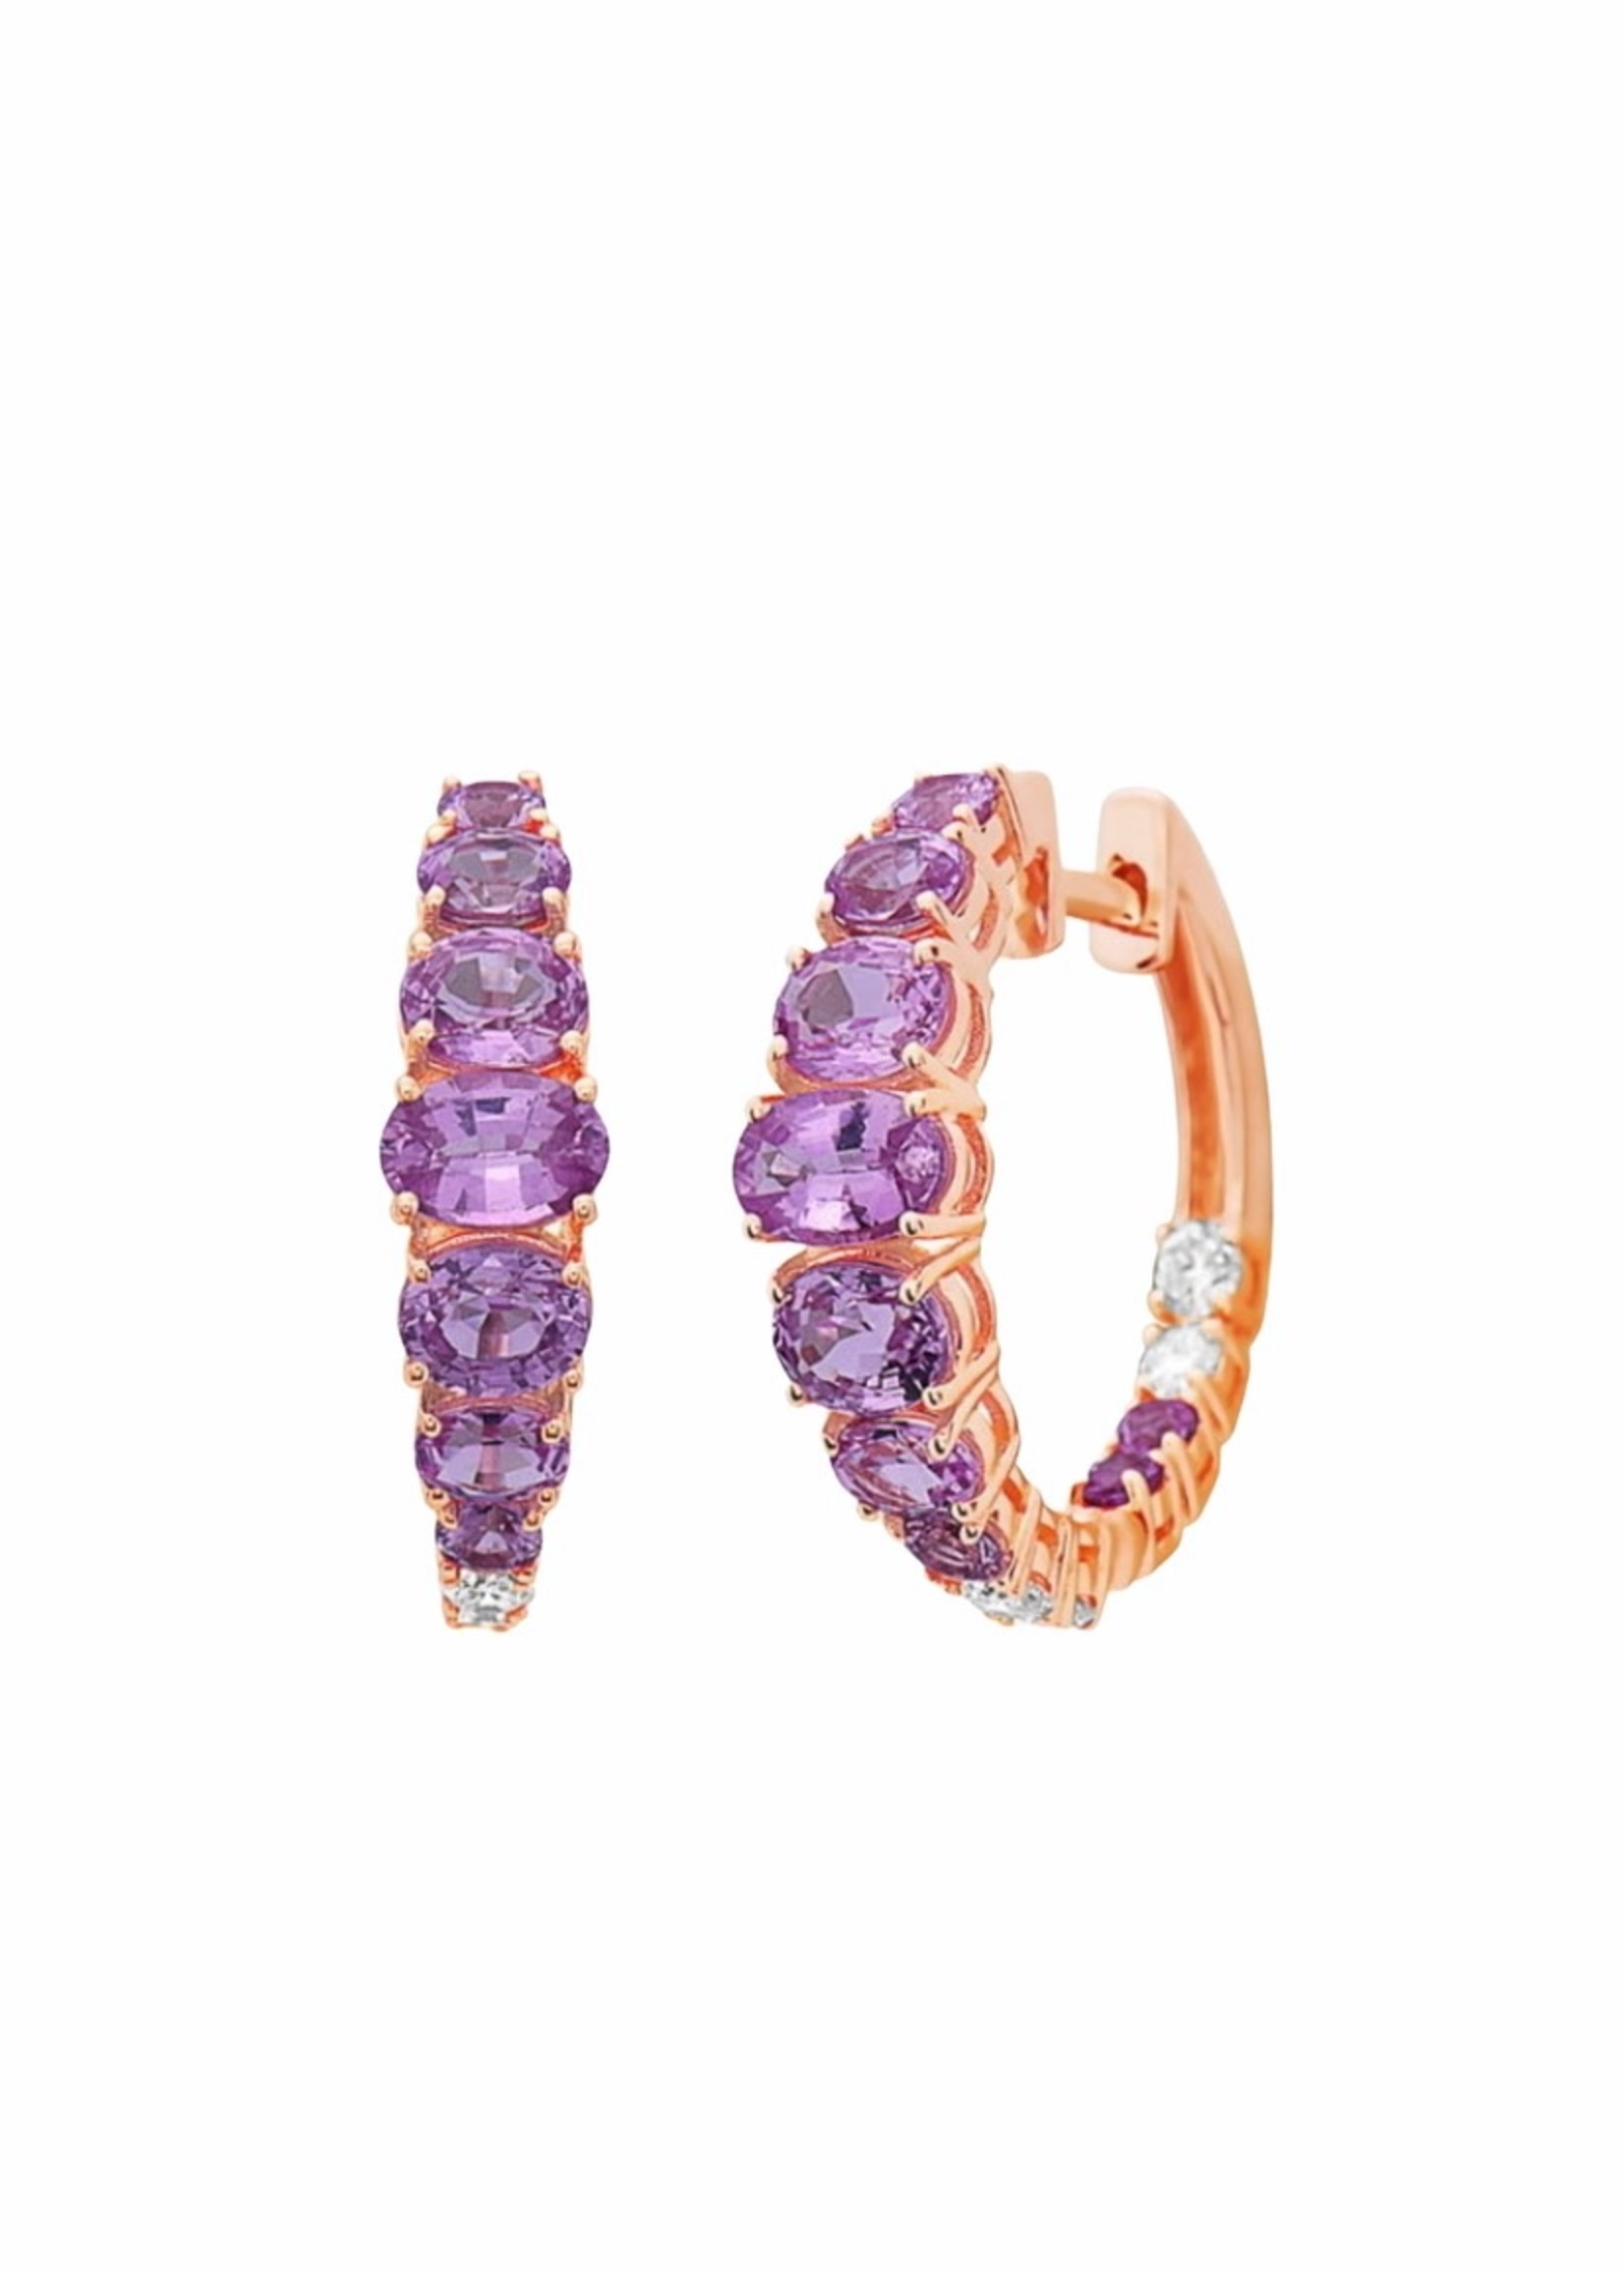 Jill Alberts Pink Sapphire Hoop Earrings